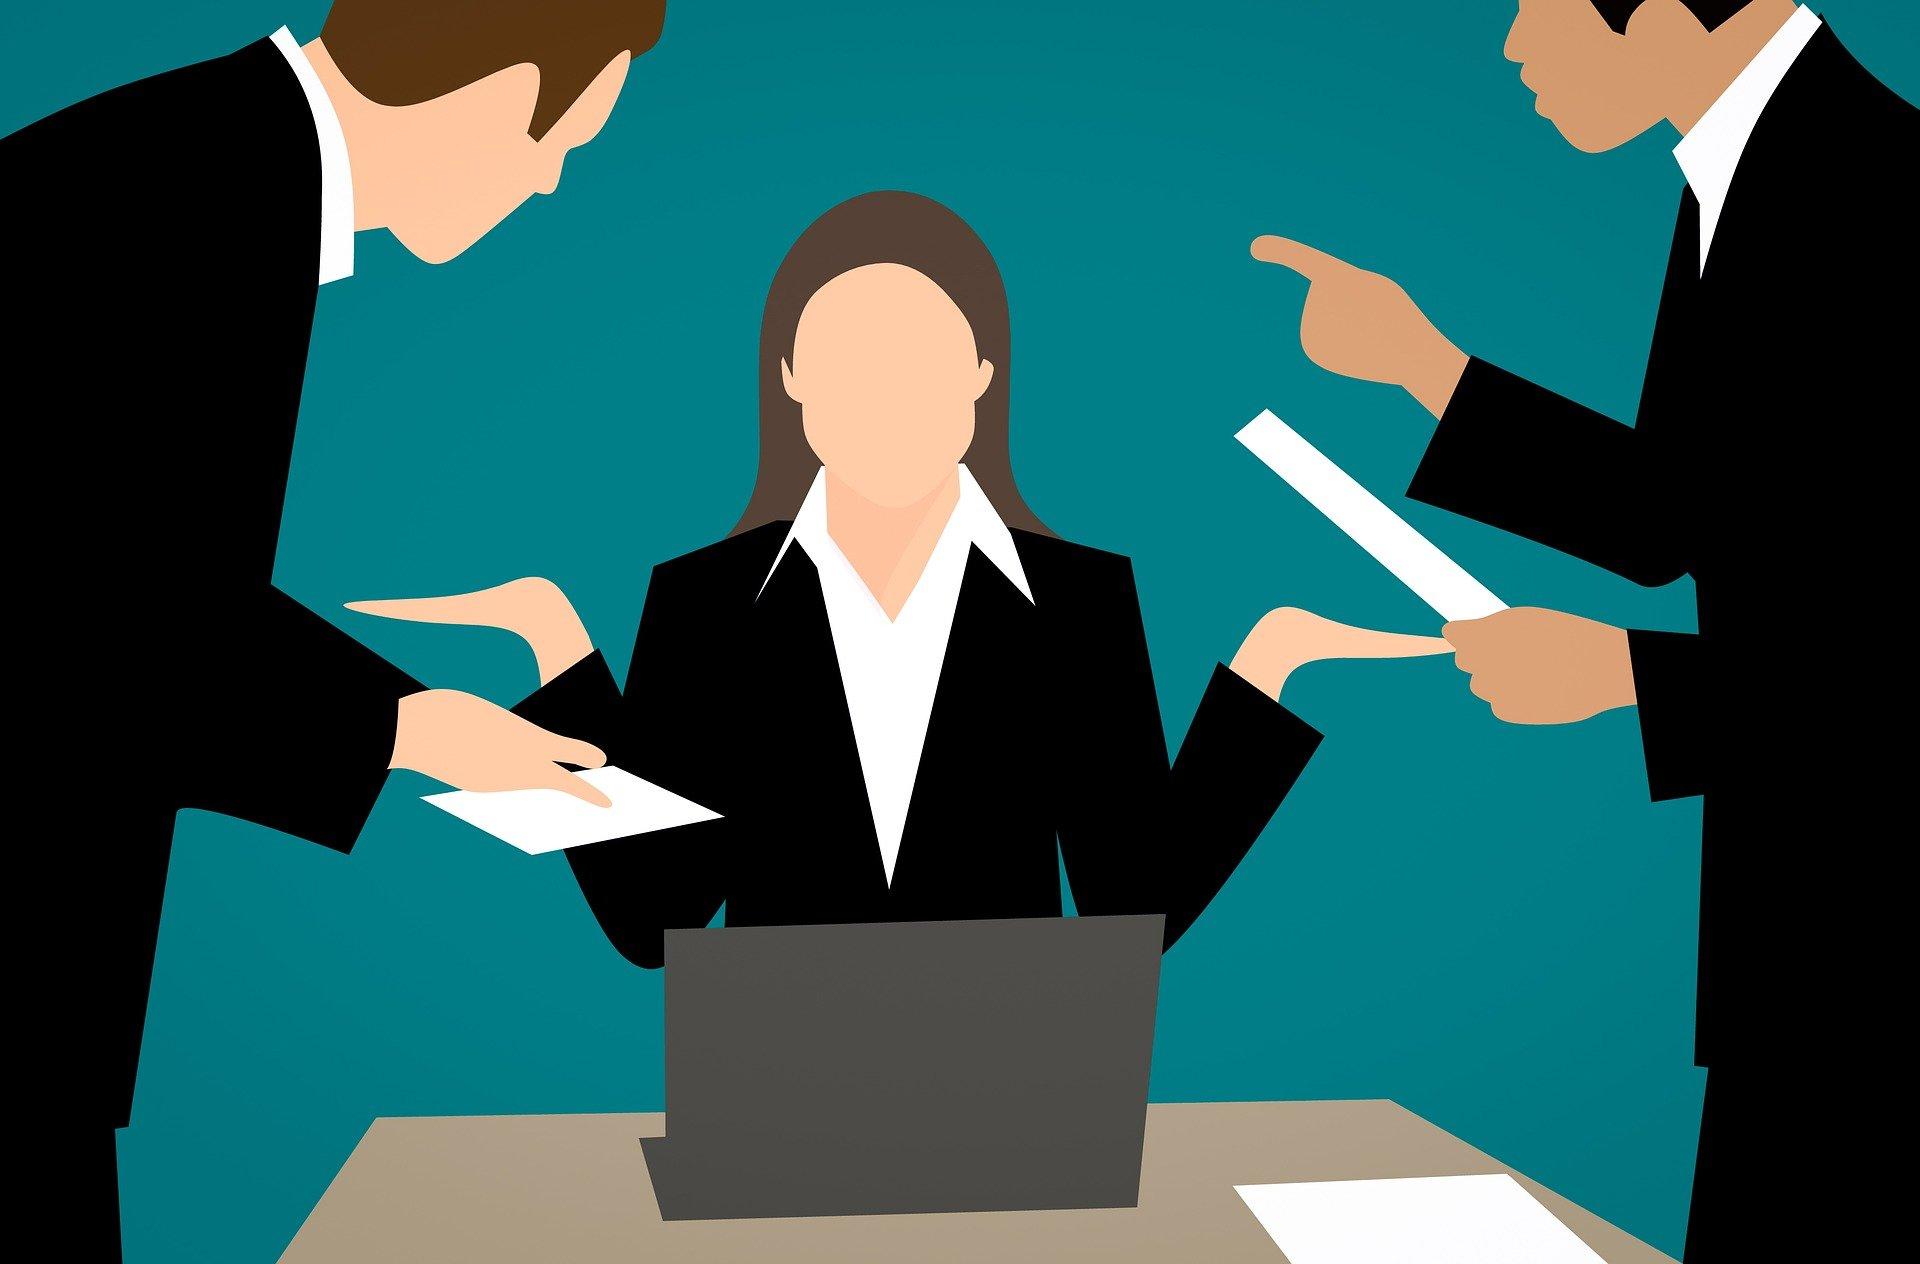 RTL Today – Ισότητα των φύλων: Λιγότερο από το ένα τρίτο των διευθυντών του Λουξεμβούργου είναι γυναίκες